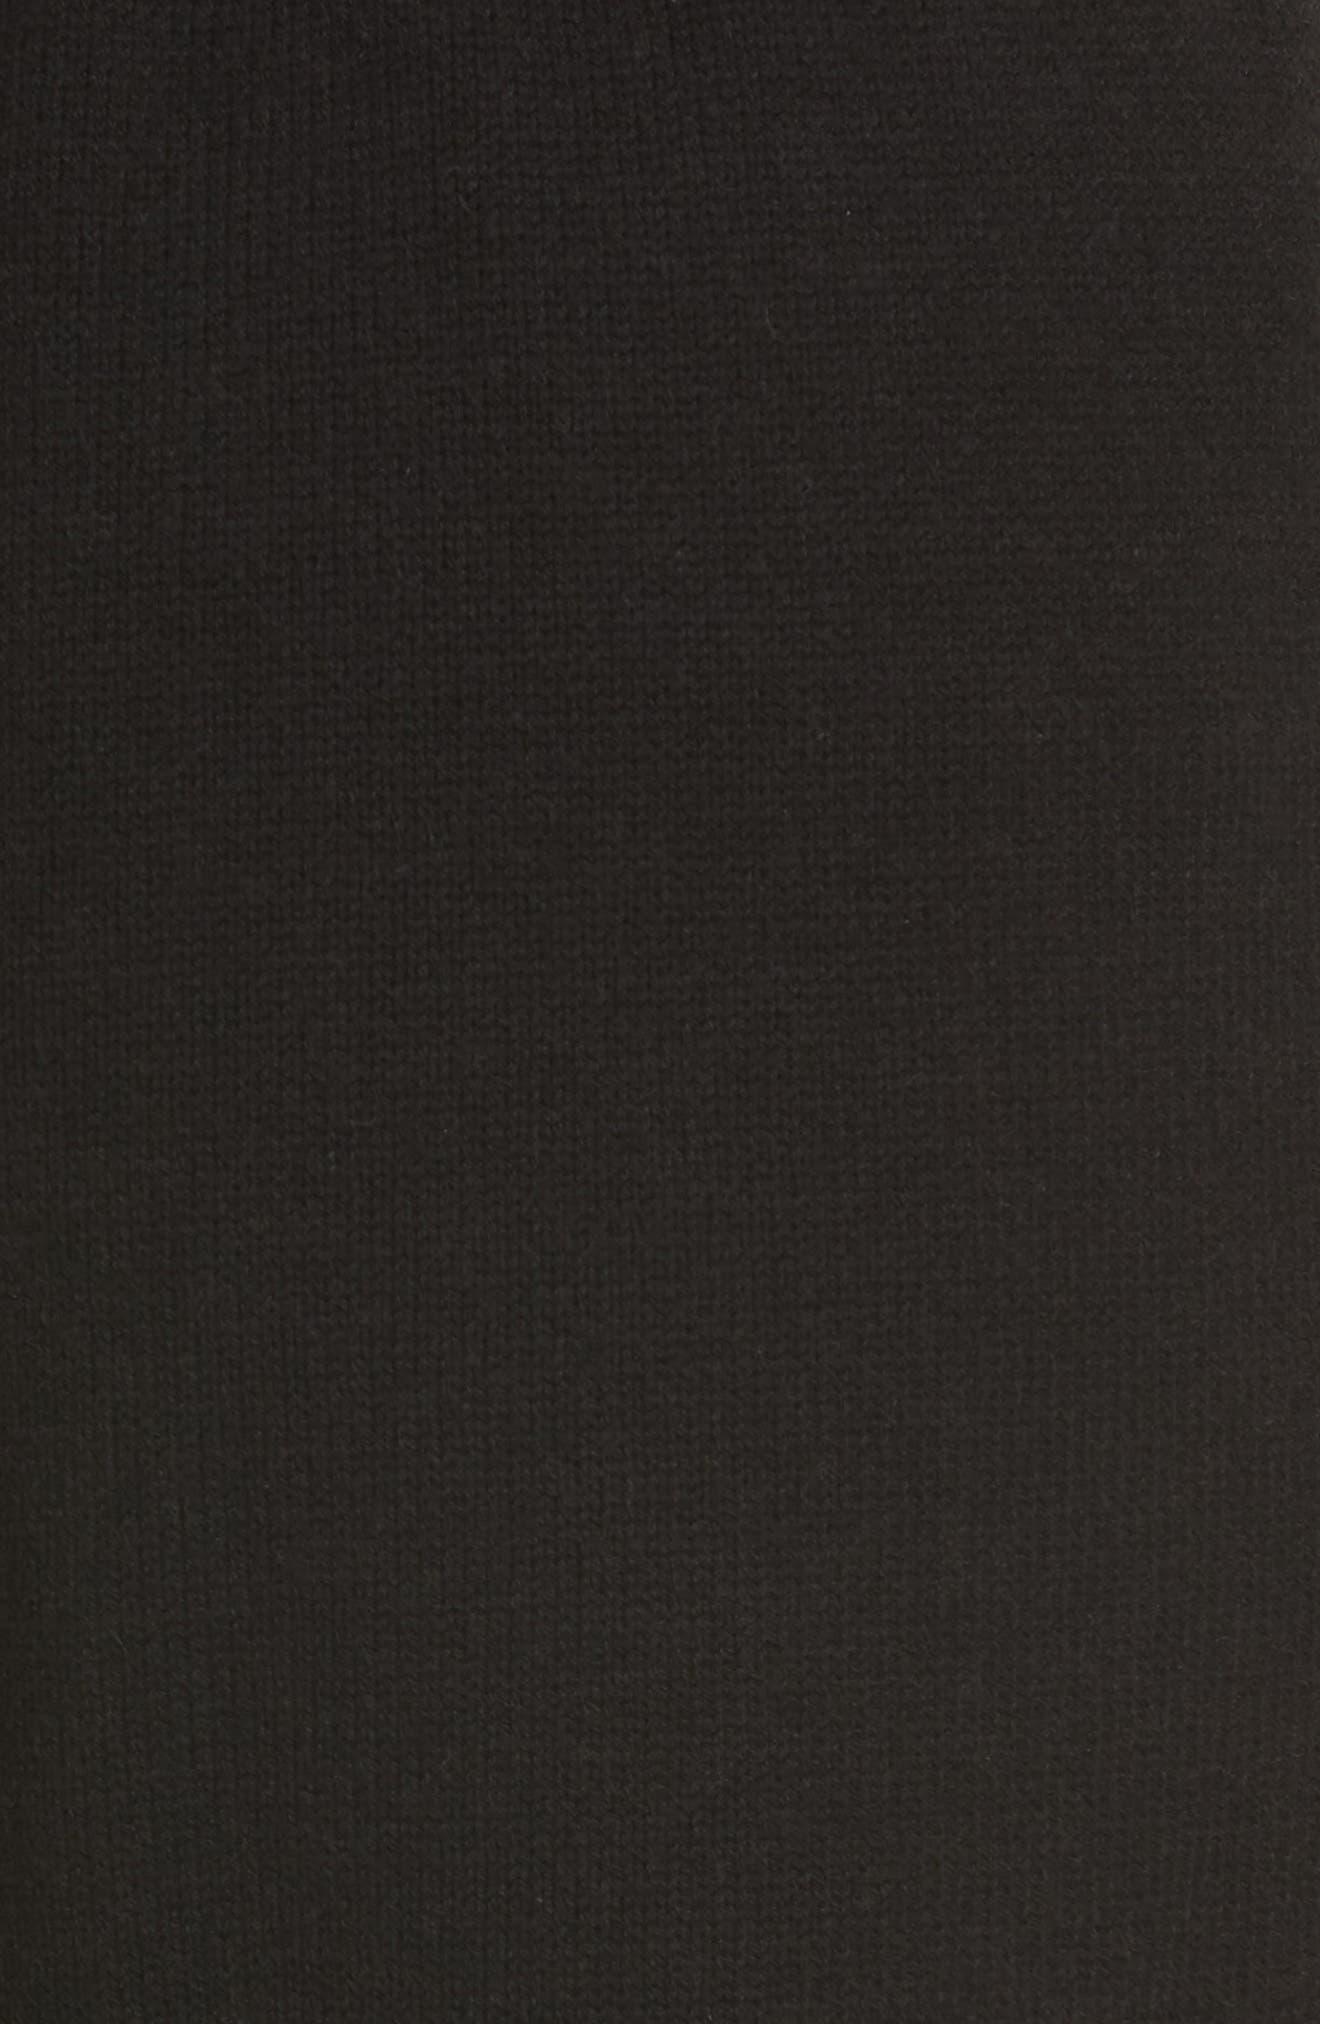 OPENING CEREMONY,                             Unisex Jogger Pants,                             Alternate thumbnail 6, color,                             BLACK MULTI